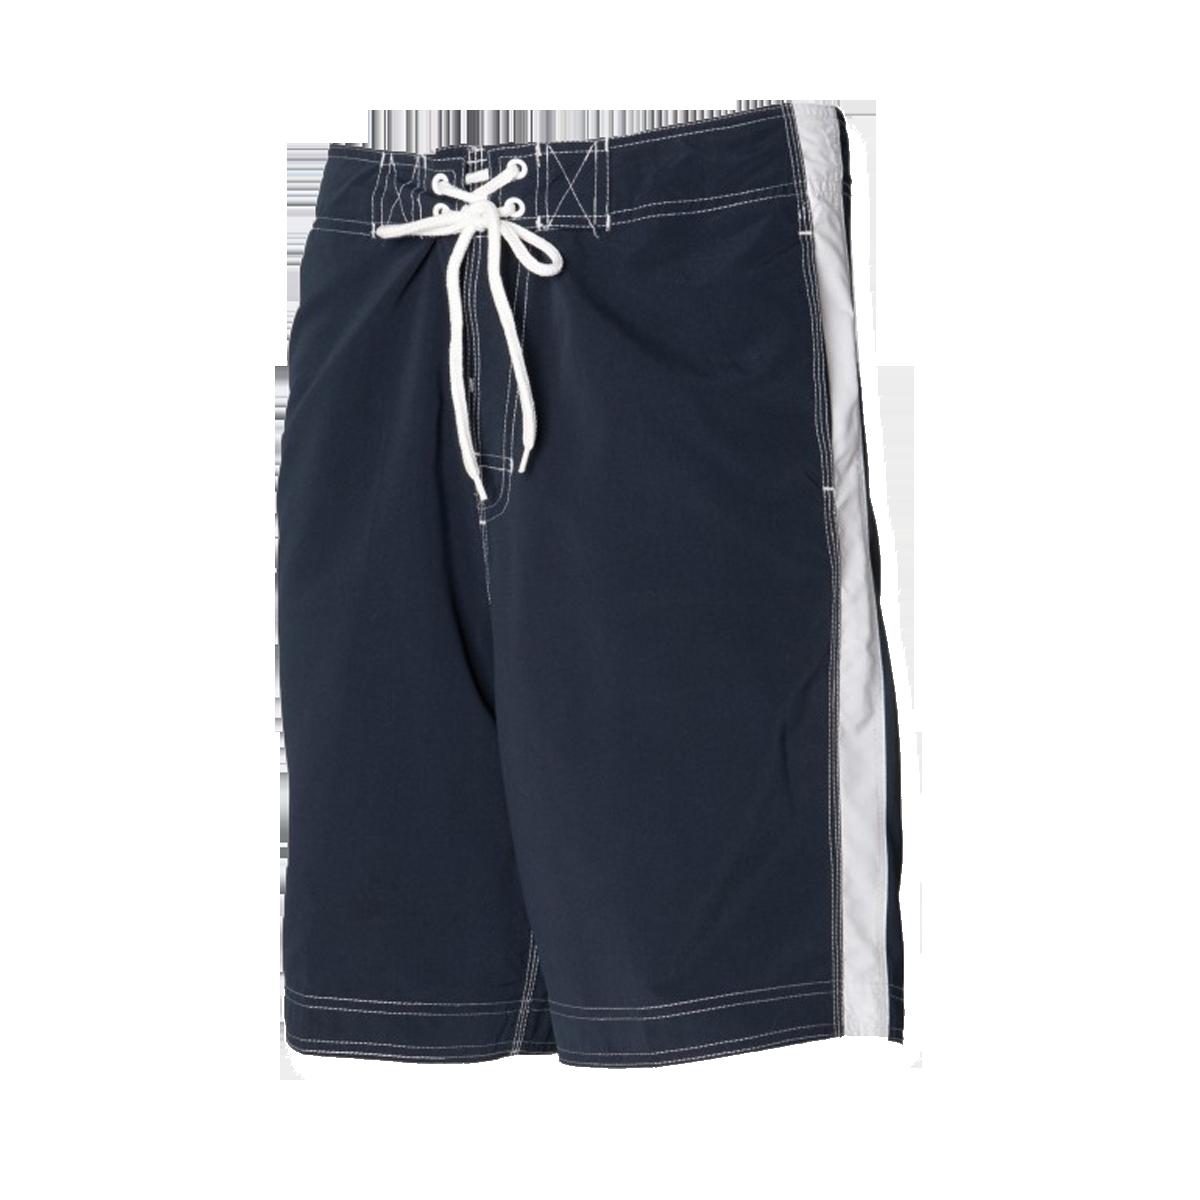 Yacht Uniform - Board Short 603